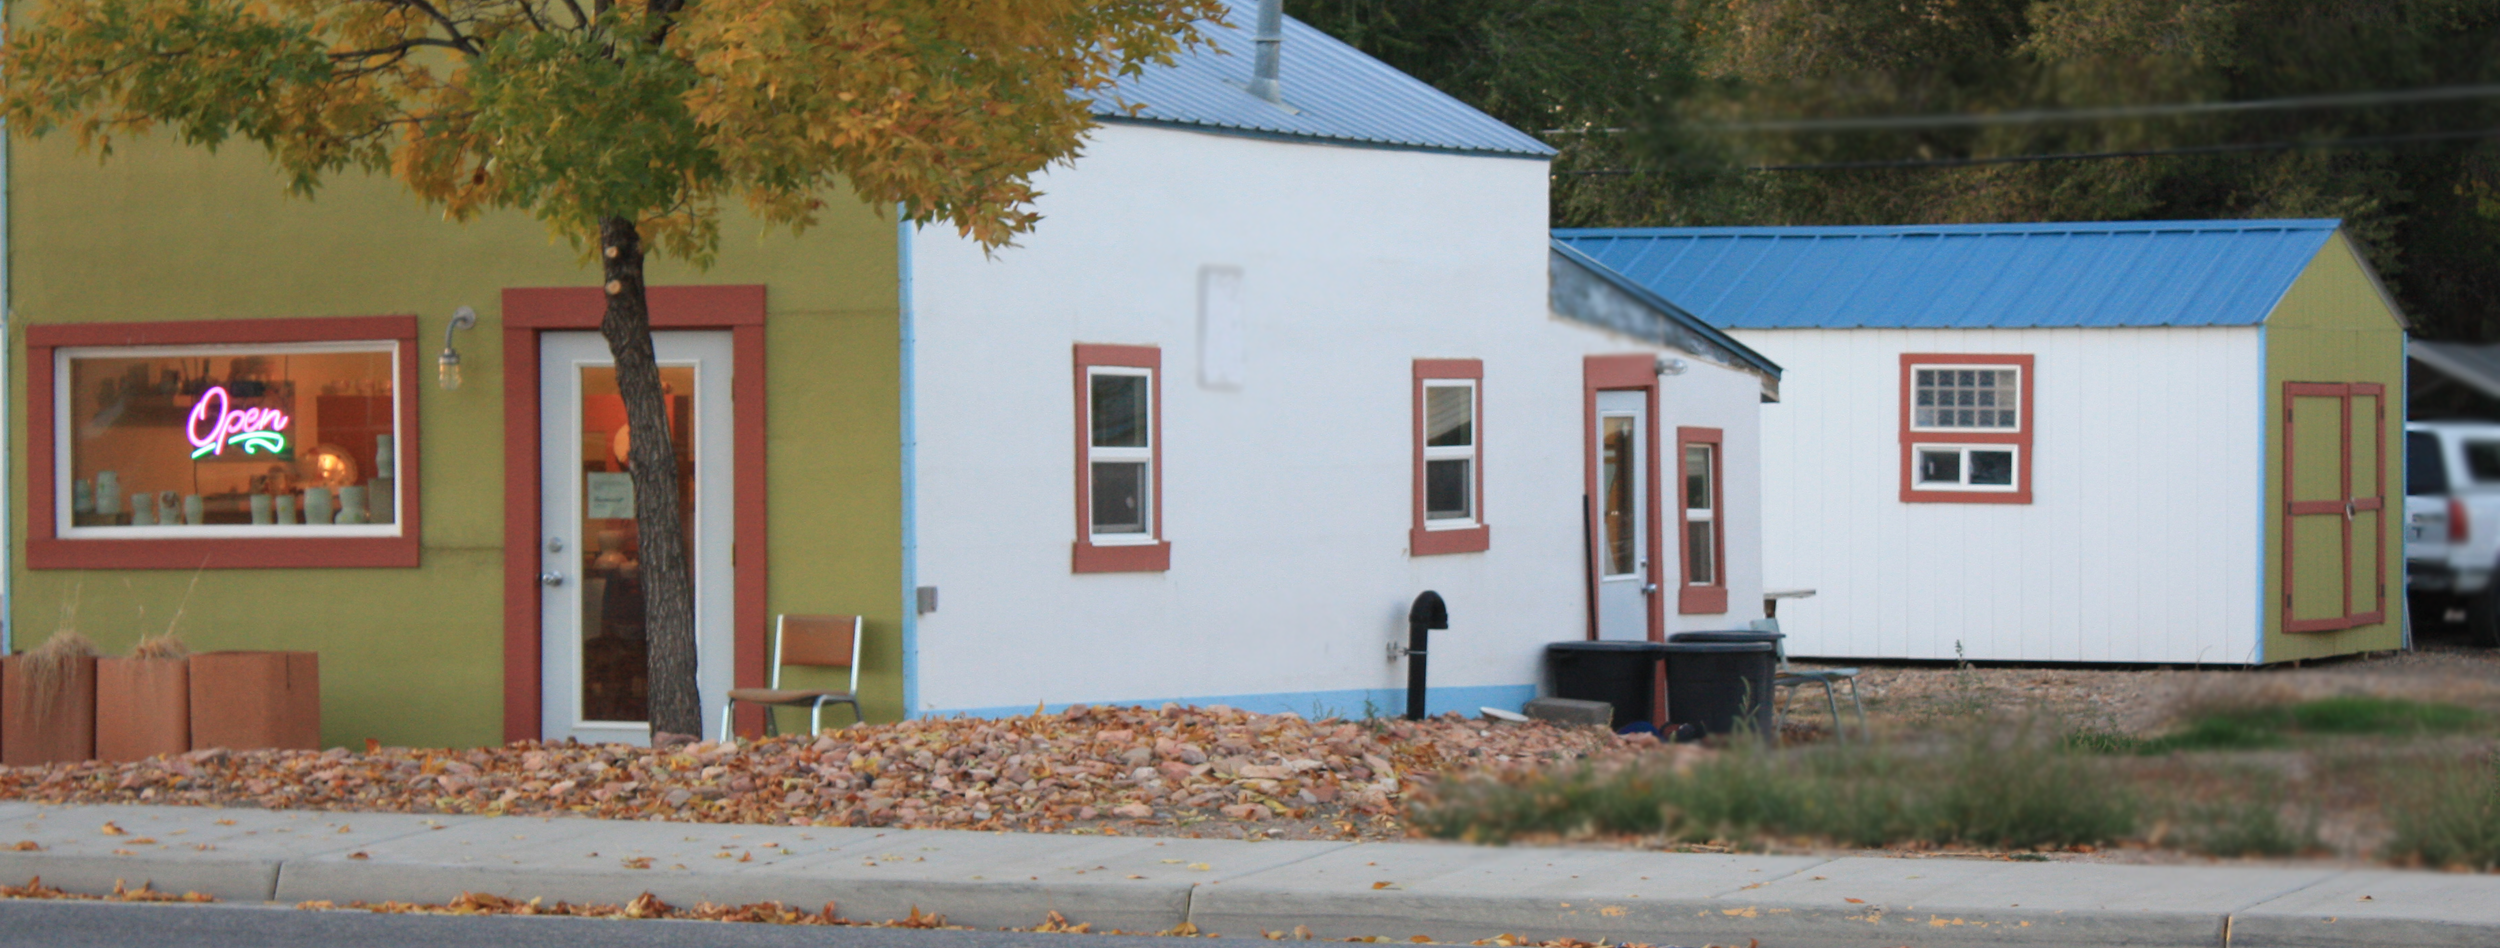 The Pottery Shop, 514 E. Main St. Rangely, CO